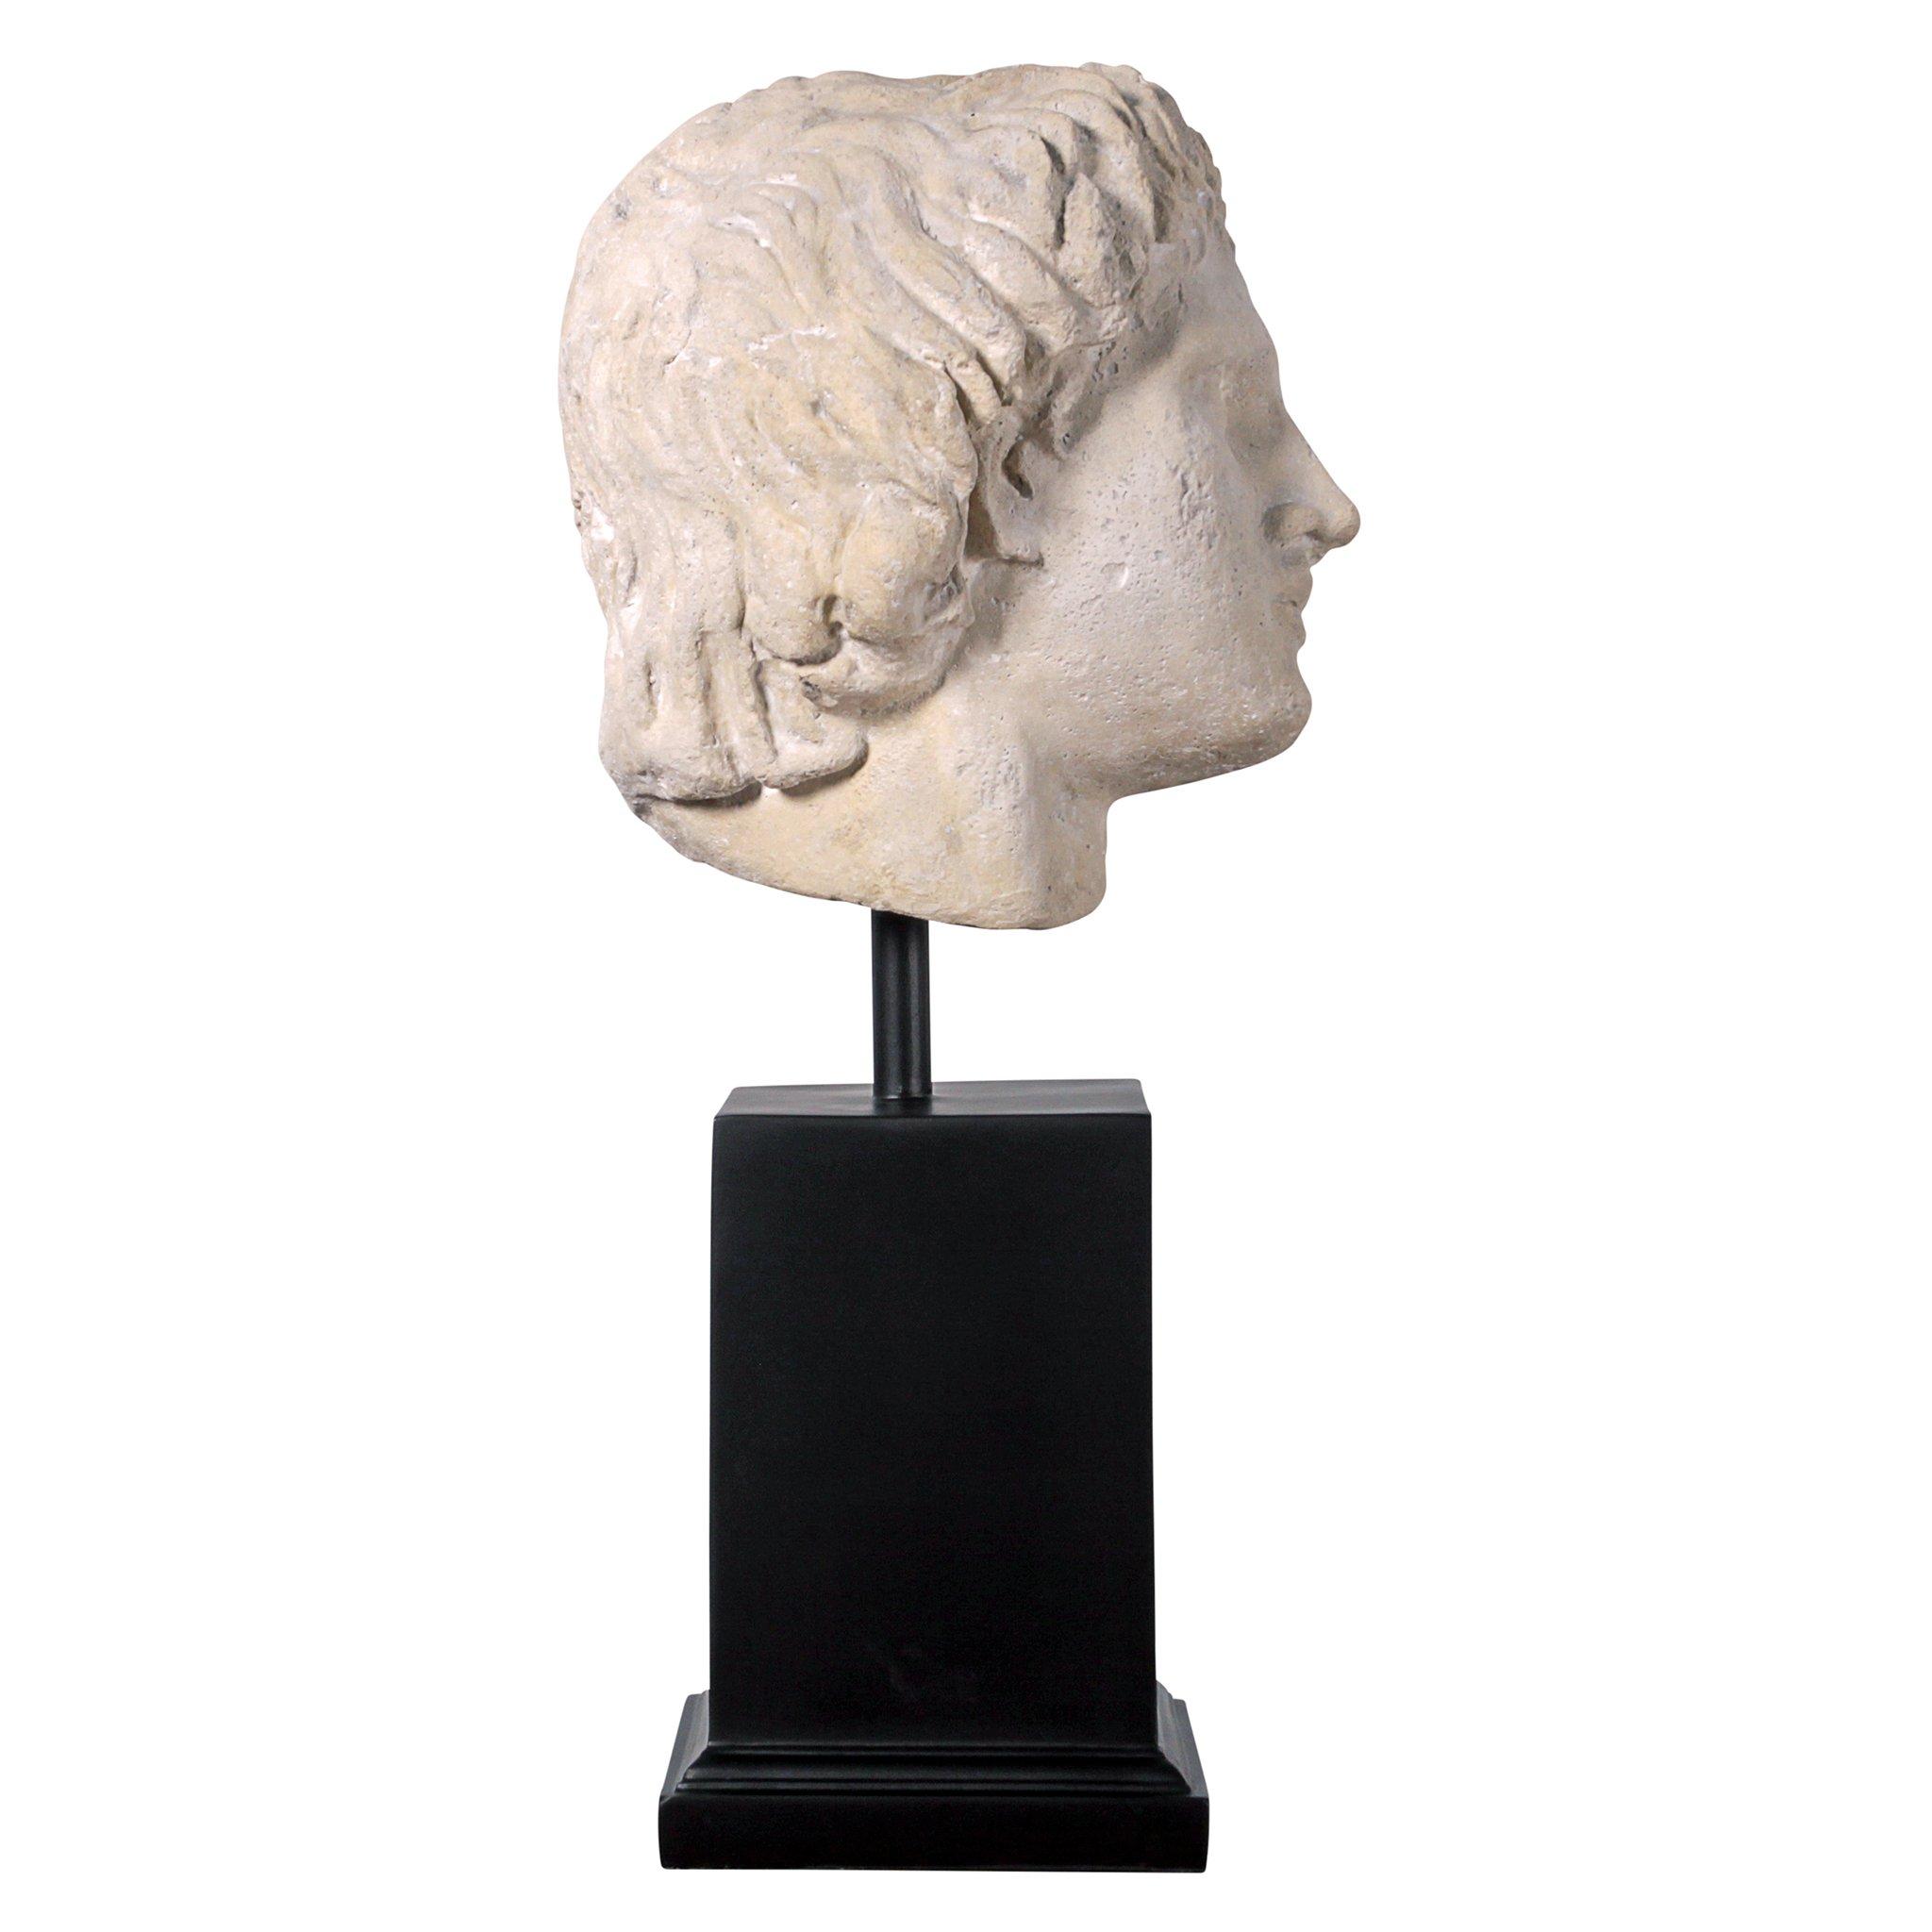 Design Toscano Alexander The Museum Mount Sculptural Bust, Antique Stone by Design Toscano (Image #2)